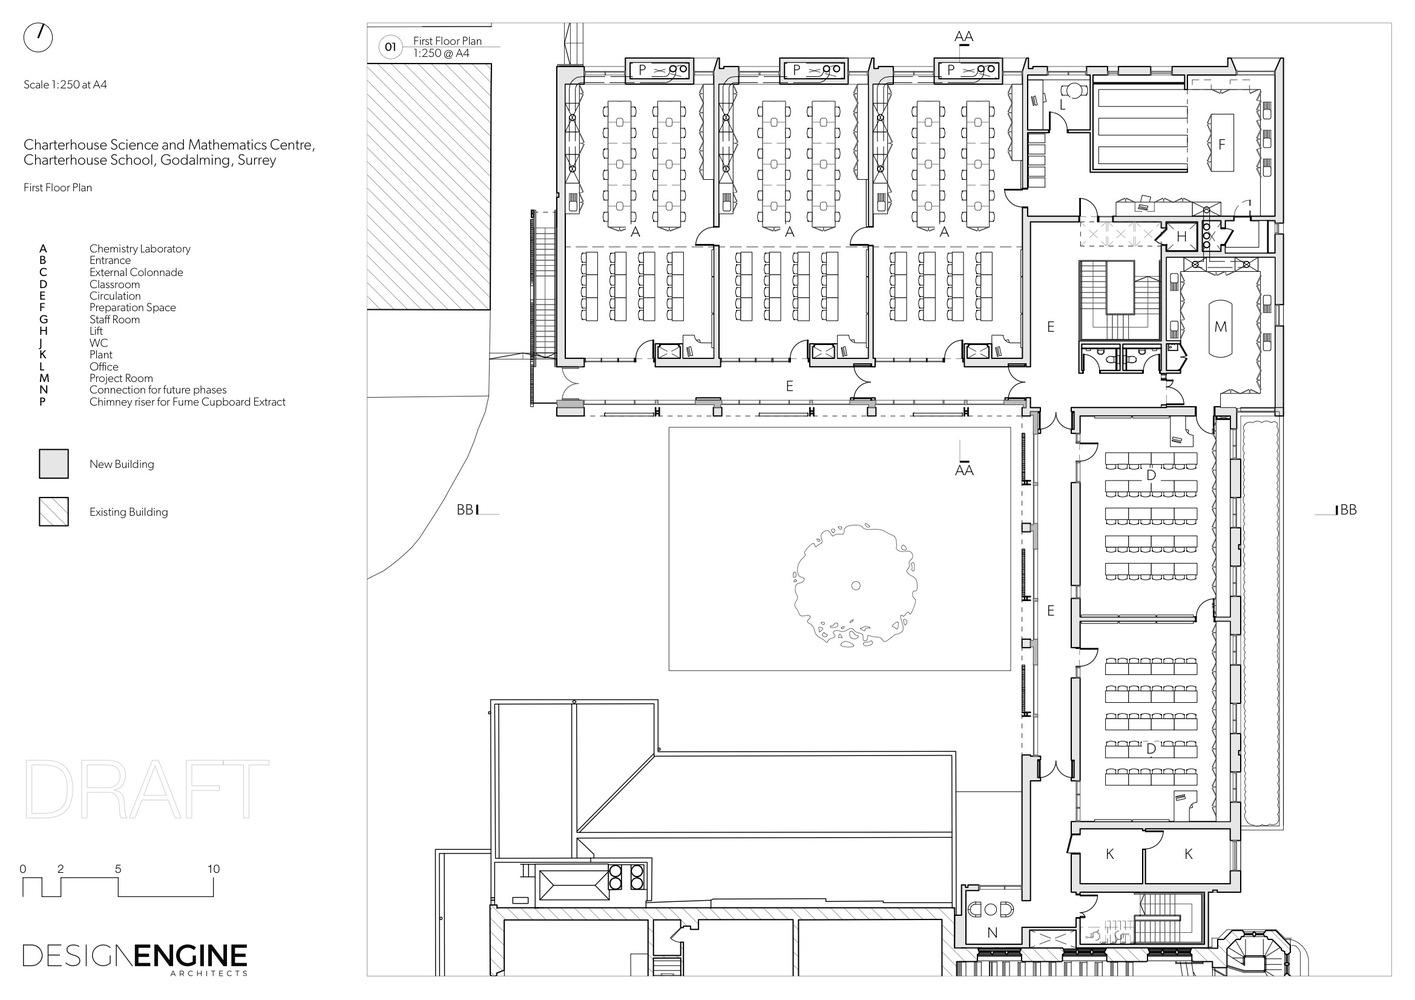 Gallery Of Charterhouse Science Mathematics Centre Design Engine